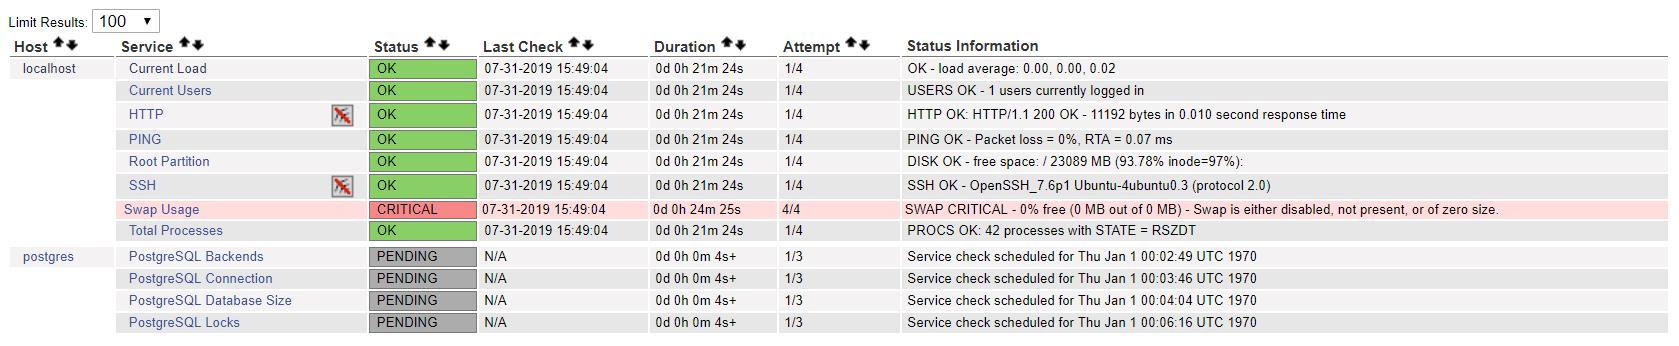 PostgreSQL Monitoring Services - Pending